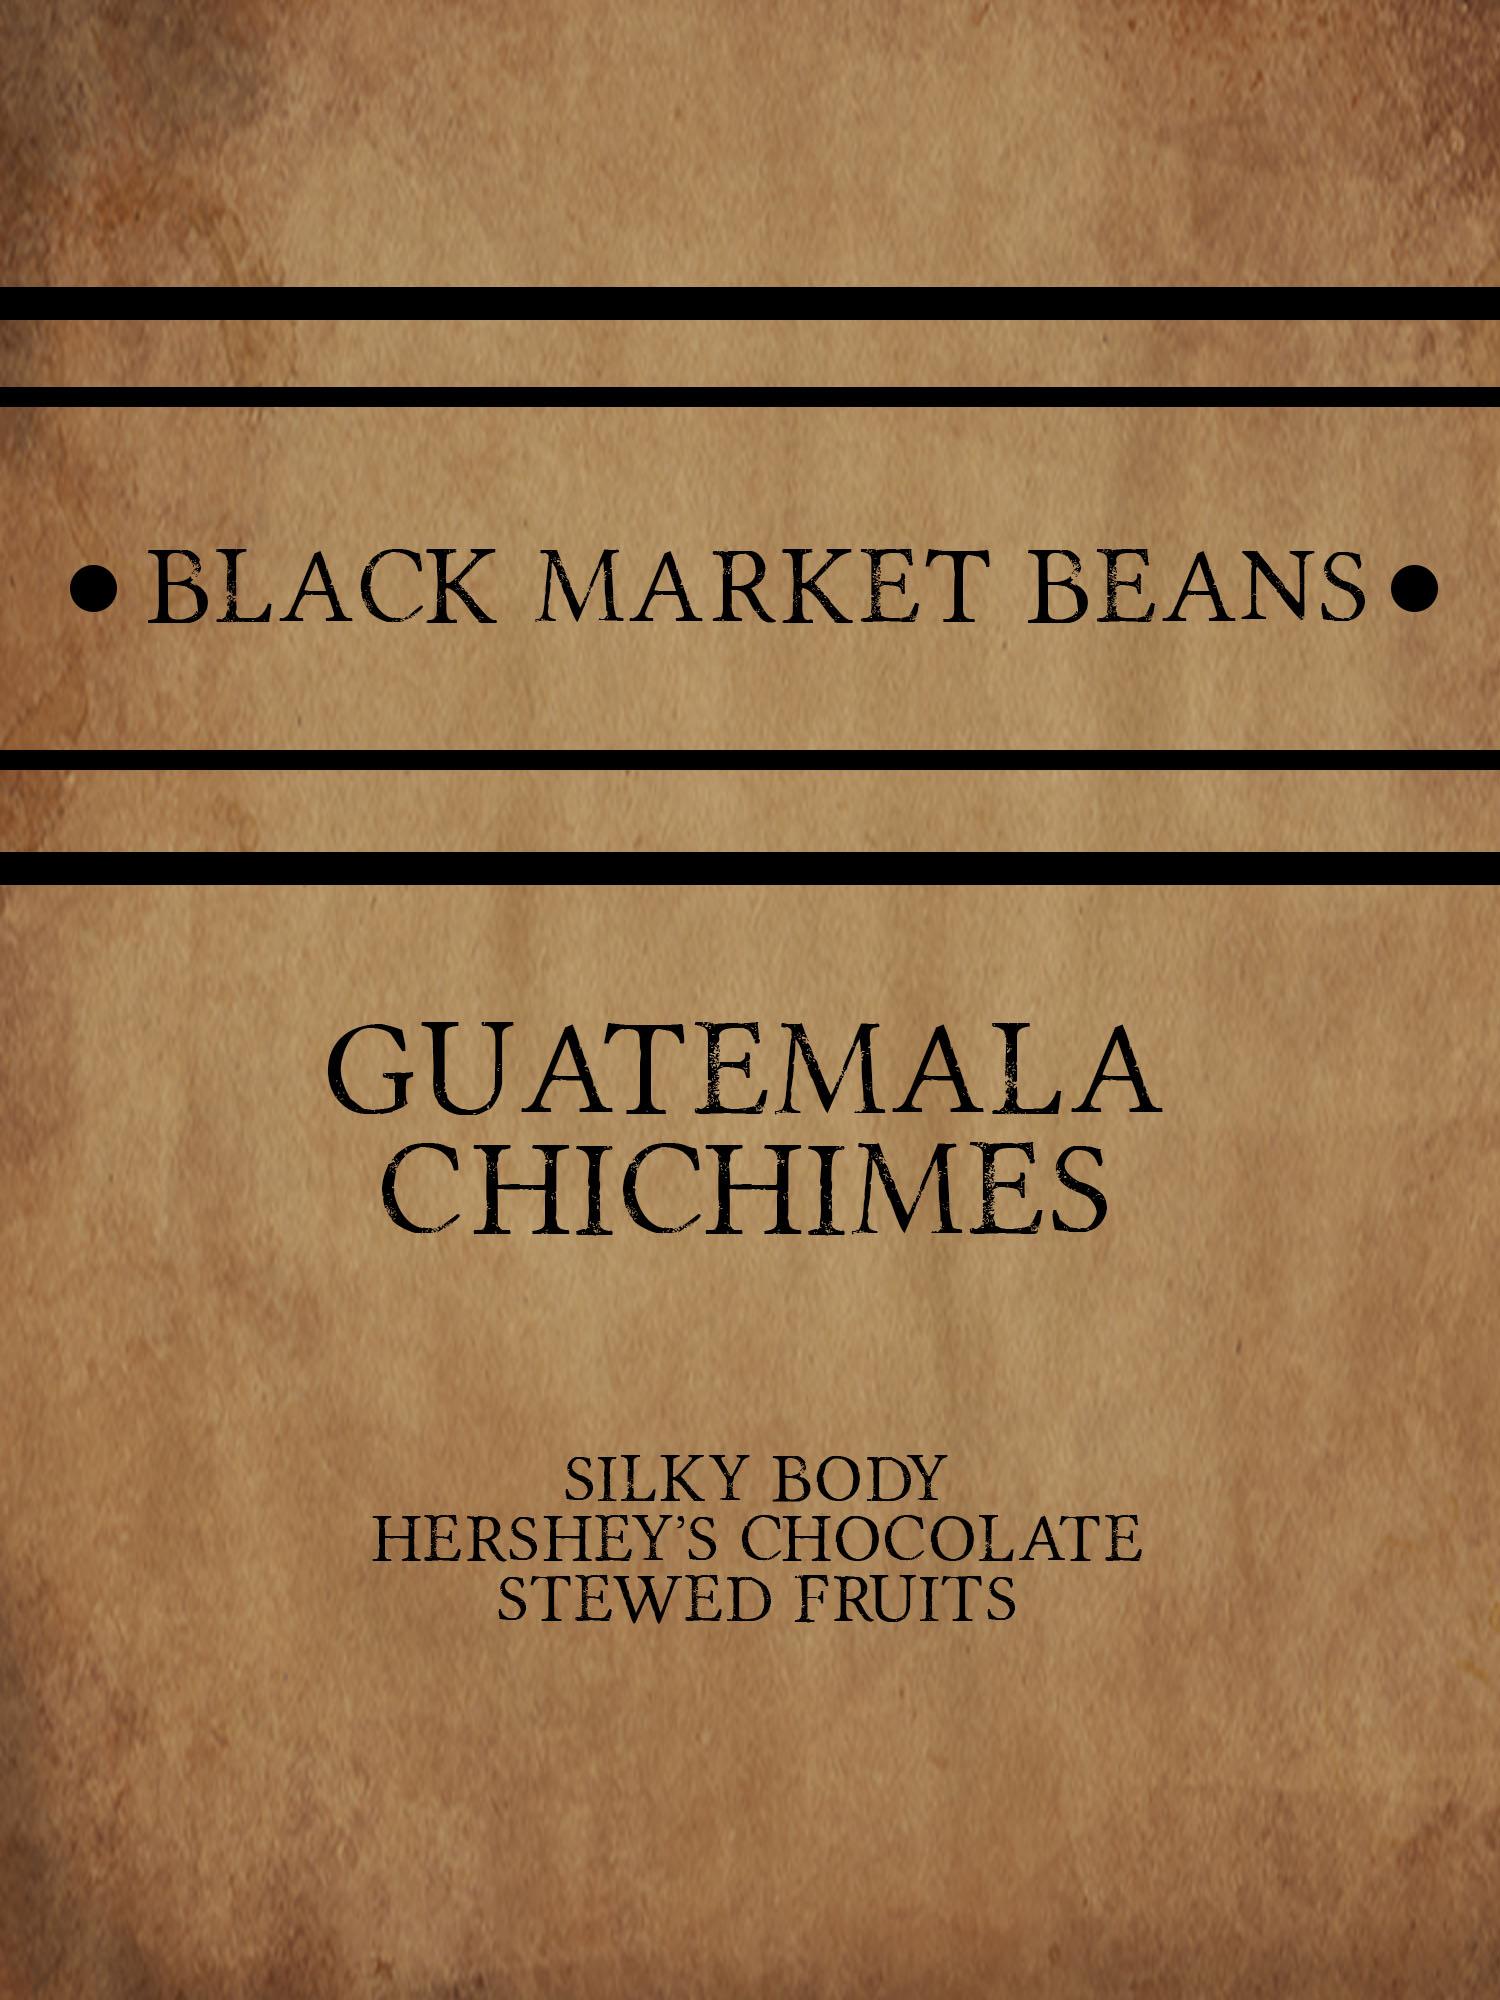 coffee_Guatemala_chichimes.jpg